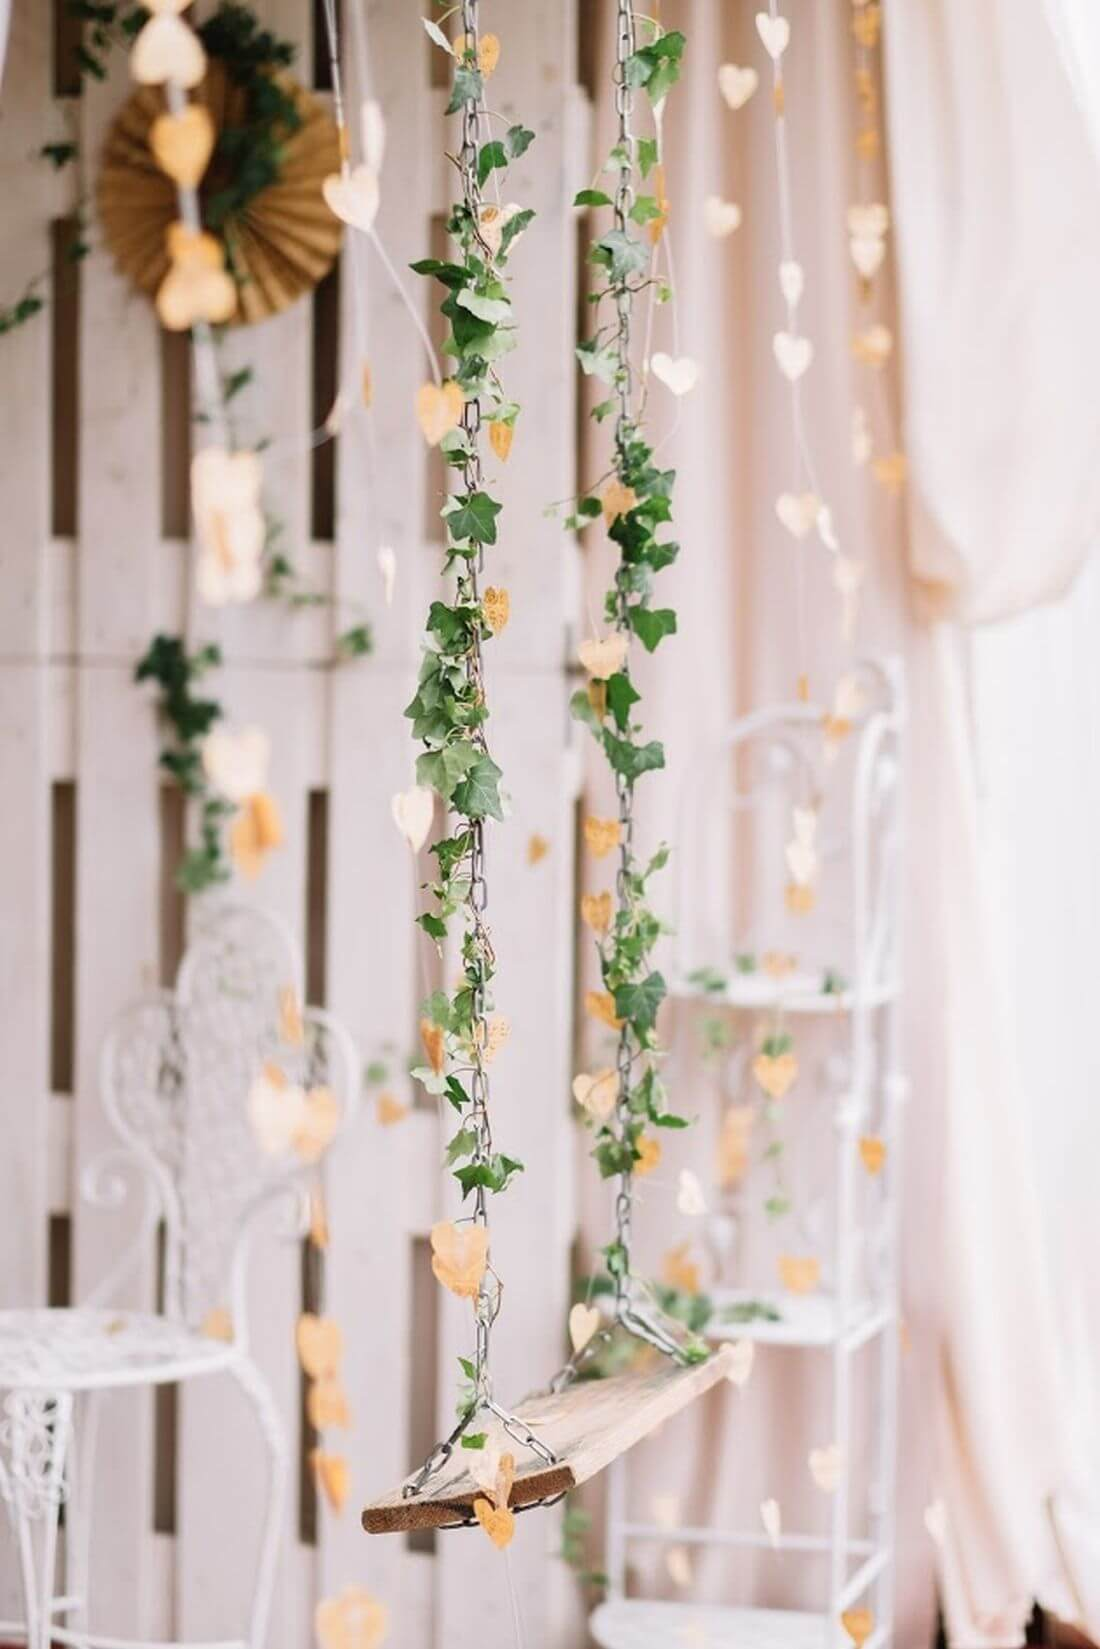 Nunta cu artificii, lavanda si muzica – Adelina si Ionut-IDO-Weddings-nuntiinaerliber (22)